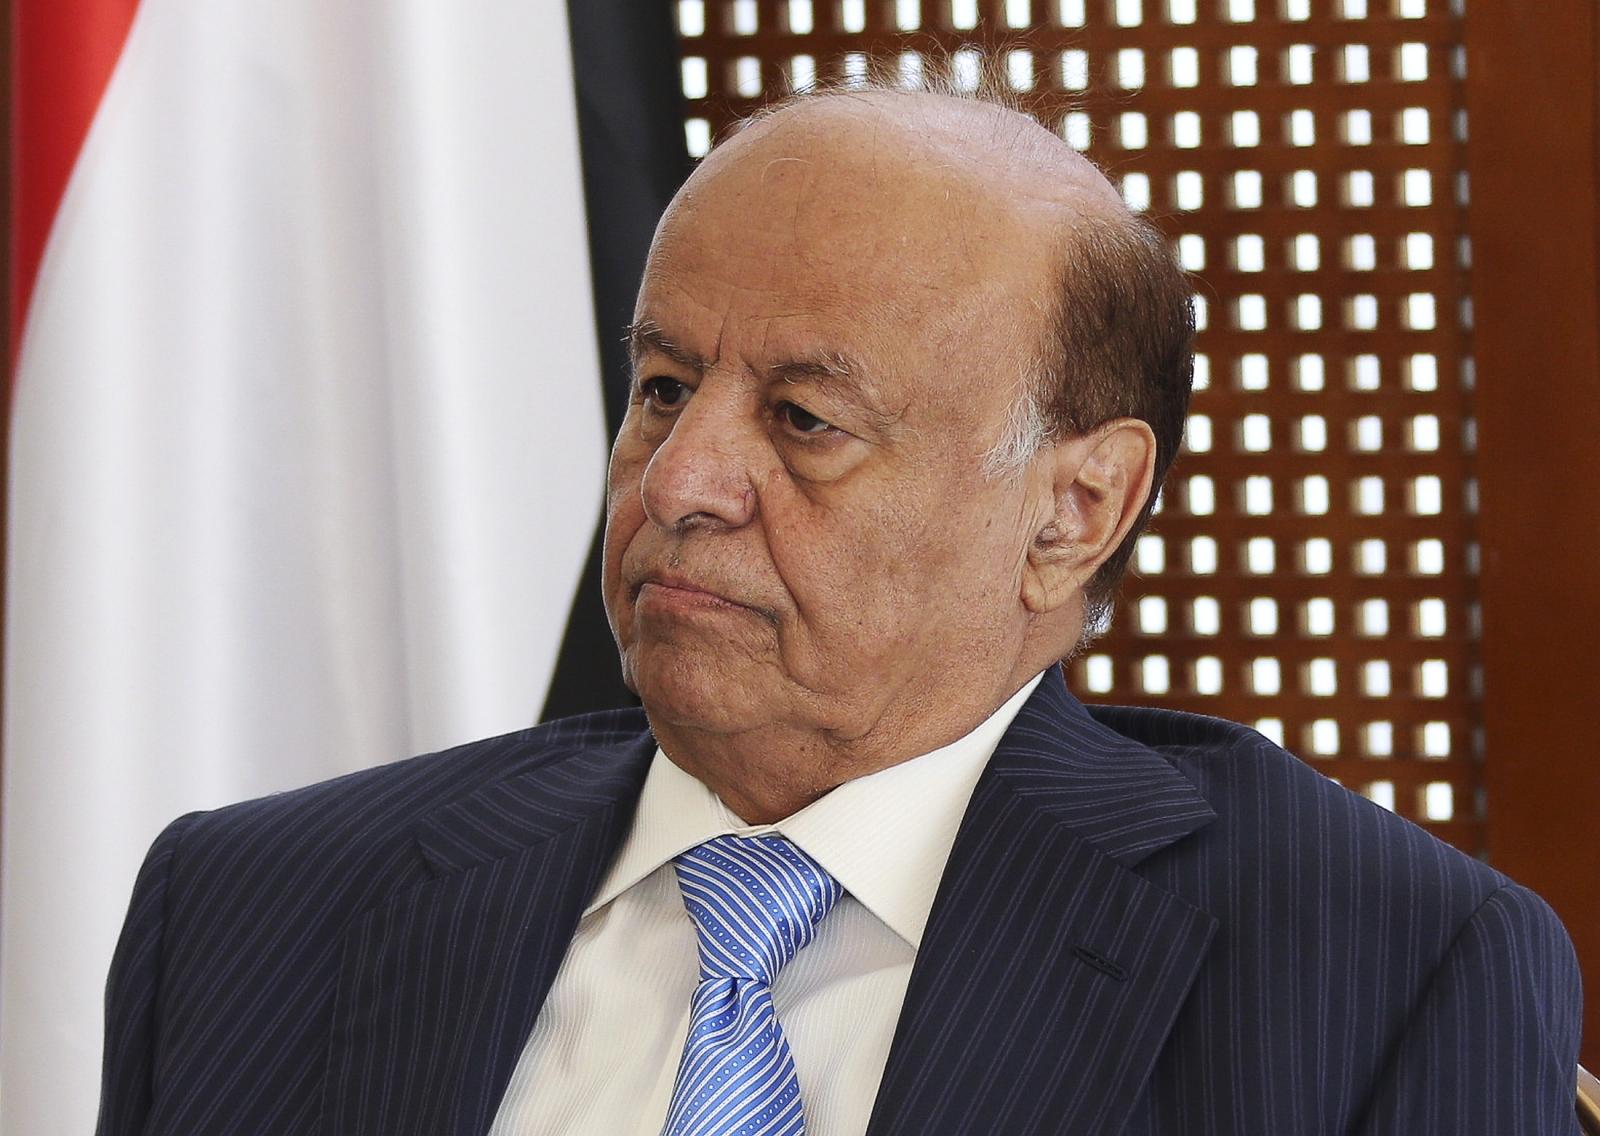 Abd Rabbuh Mansour Hadi